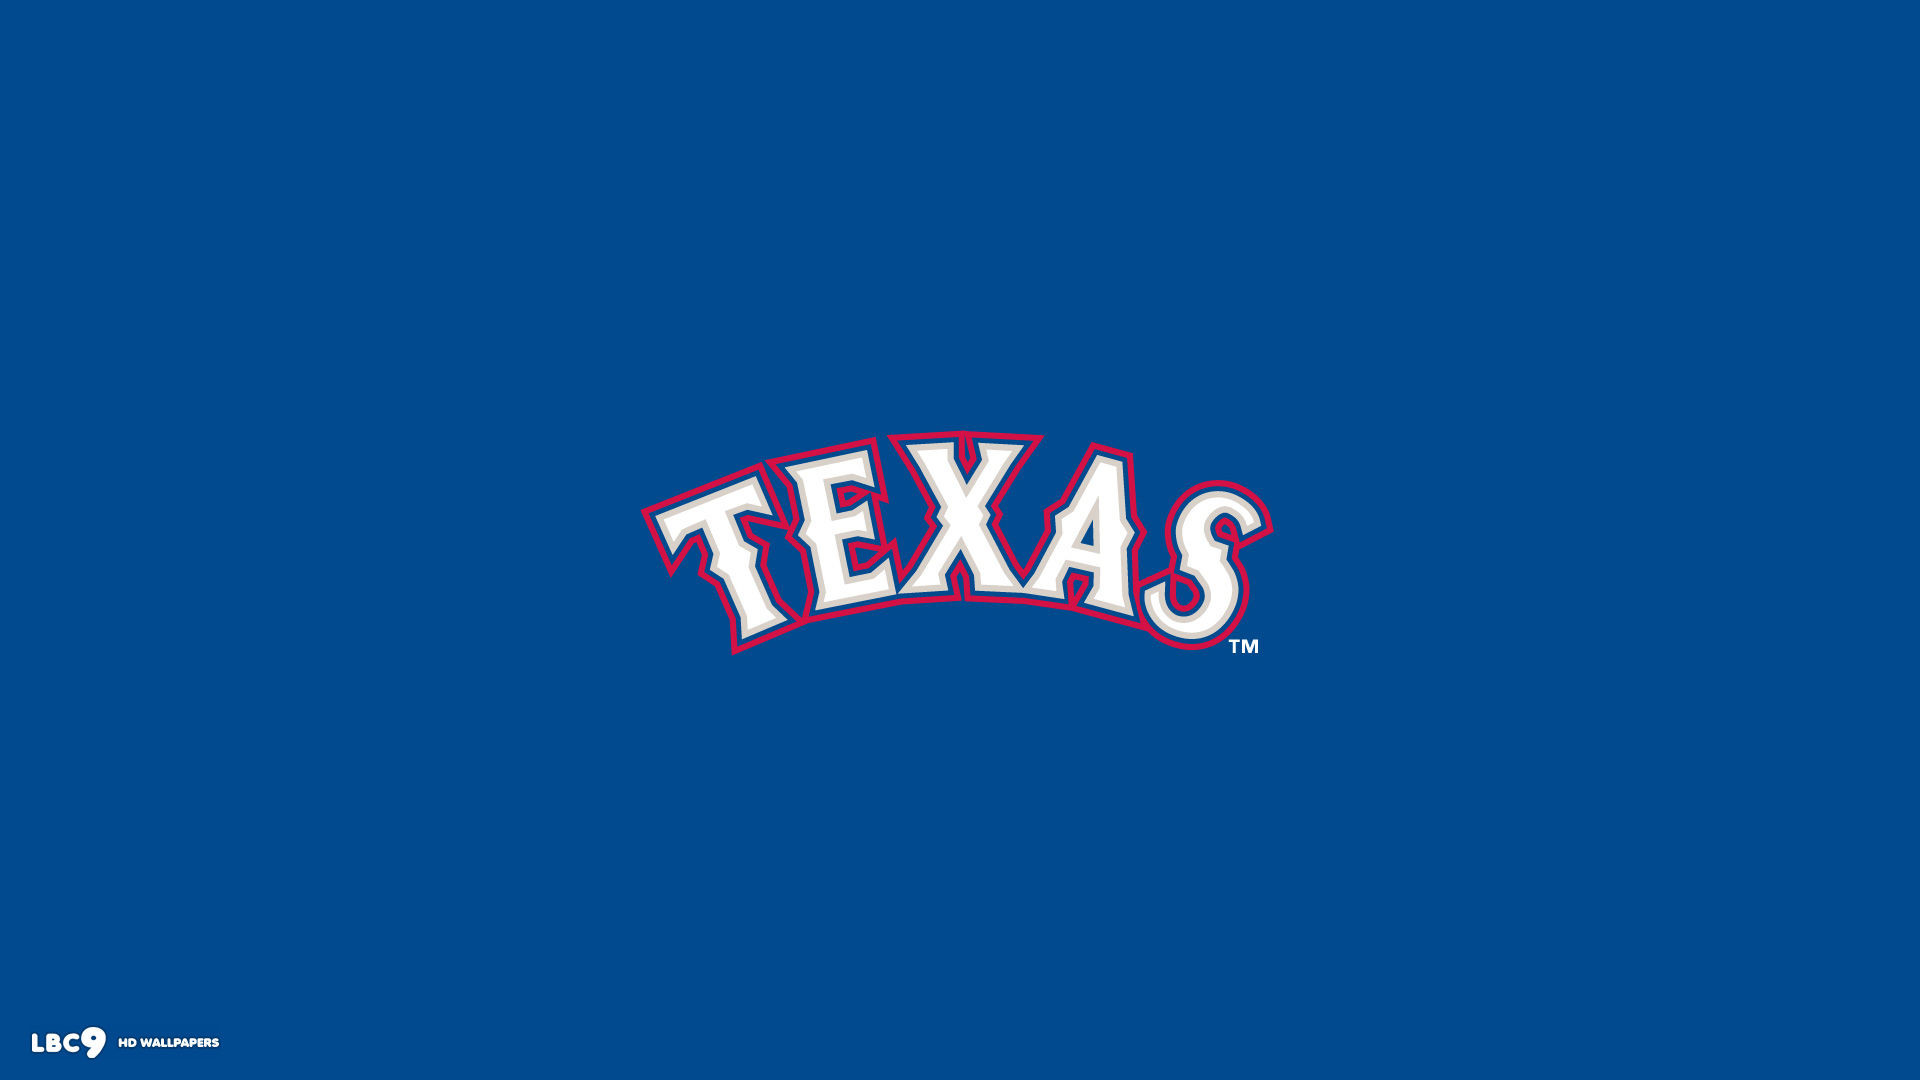 Free Texas Screensavers and Wallpaper | HD Wallpapers | Pinterest | Hd  wallpaper and Wallpaper